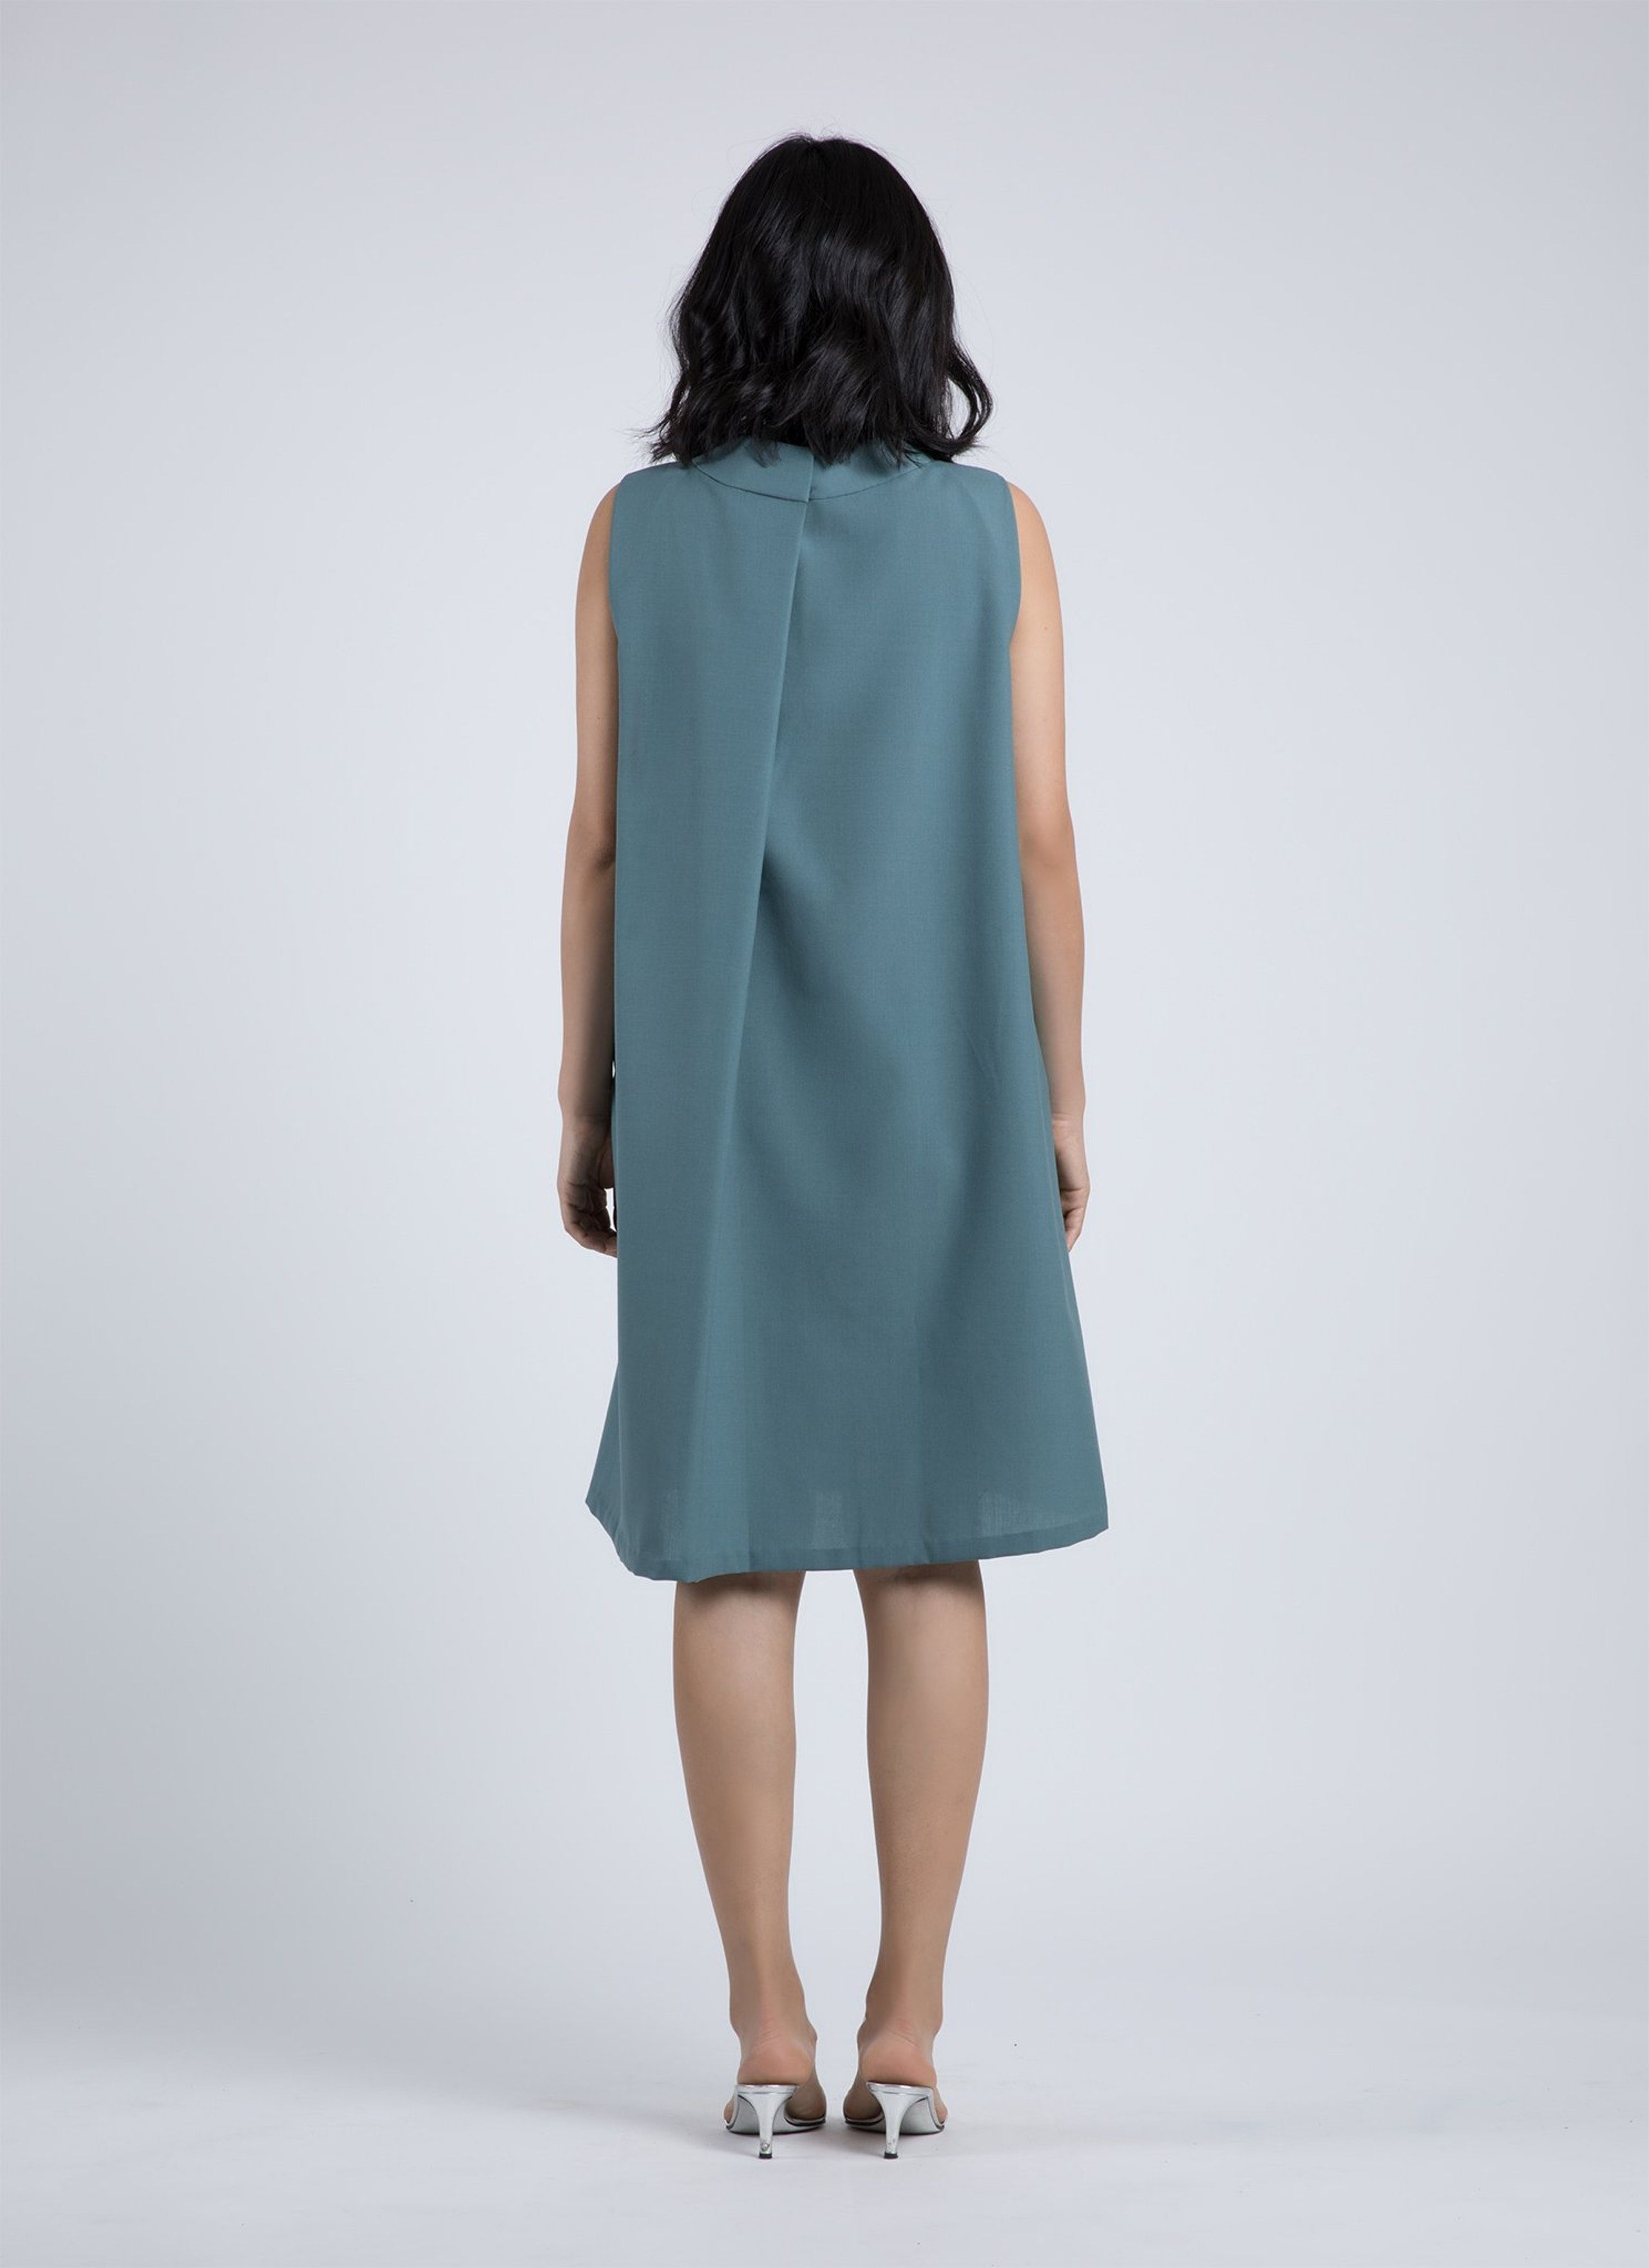 d39c97a4fc7 Vase Back Open Pleat Dress - Blue Green